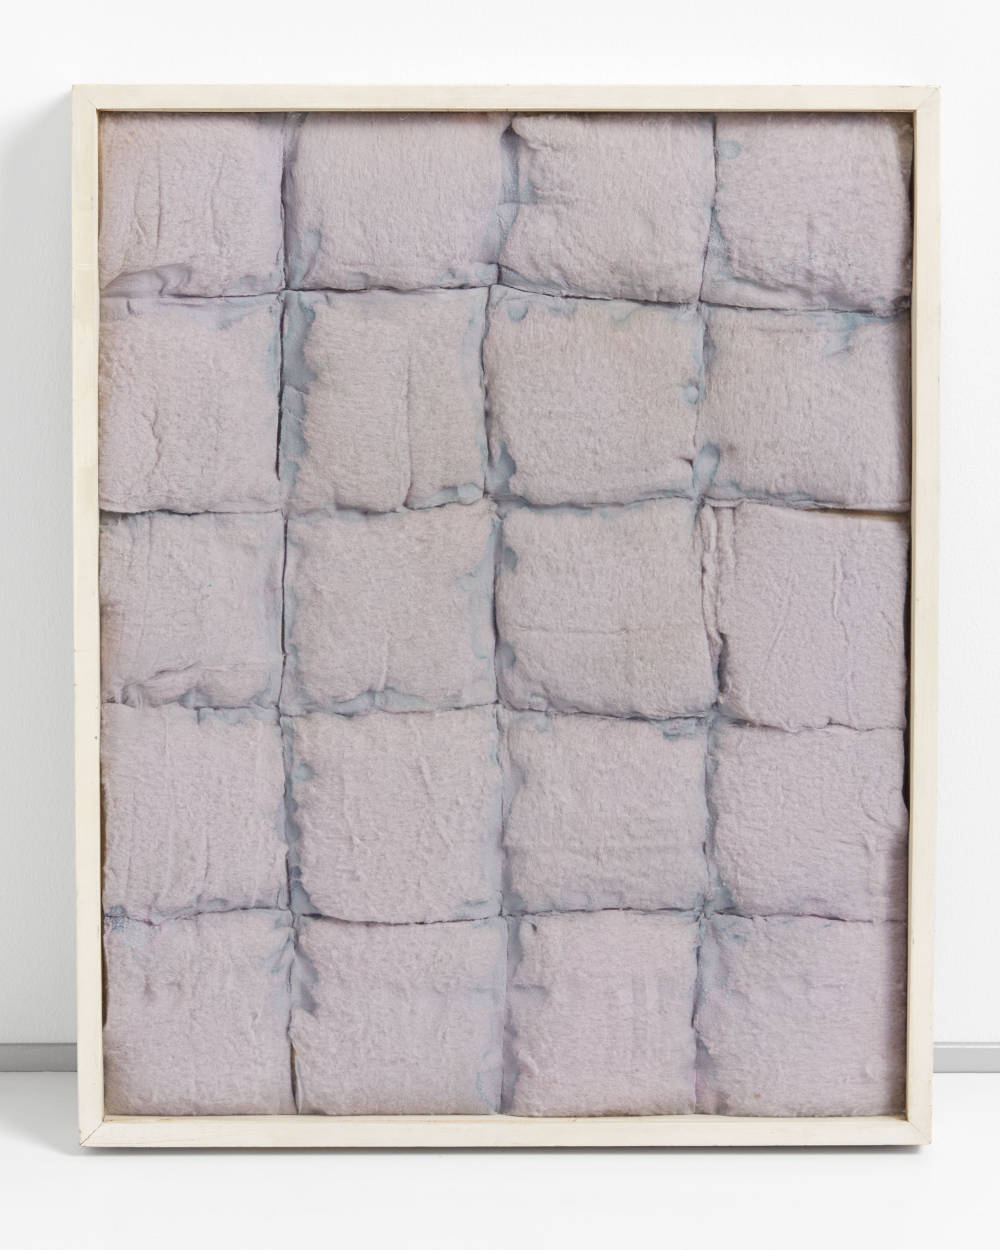 Piero Manzoni, Achrome, 1961. Square cotton wading and cobalt chloride 56.2 x 47.2 cm / 22 1/8 x 18 5/8 in. Herning Museum of Contemporary Art (HEART) Photo: Søren Krogh © Fondazione Piero Manzoni, Milan